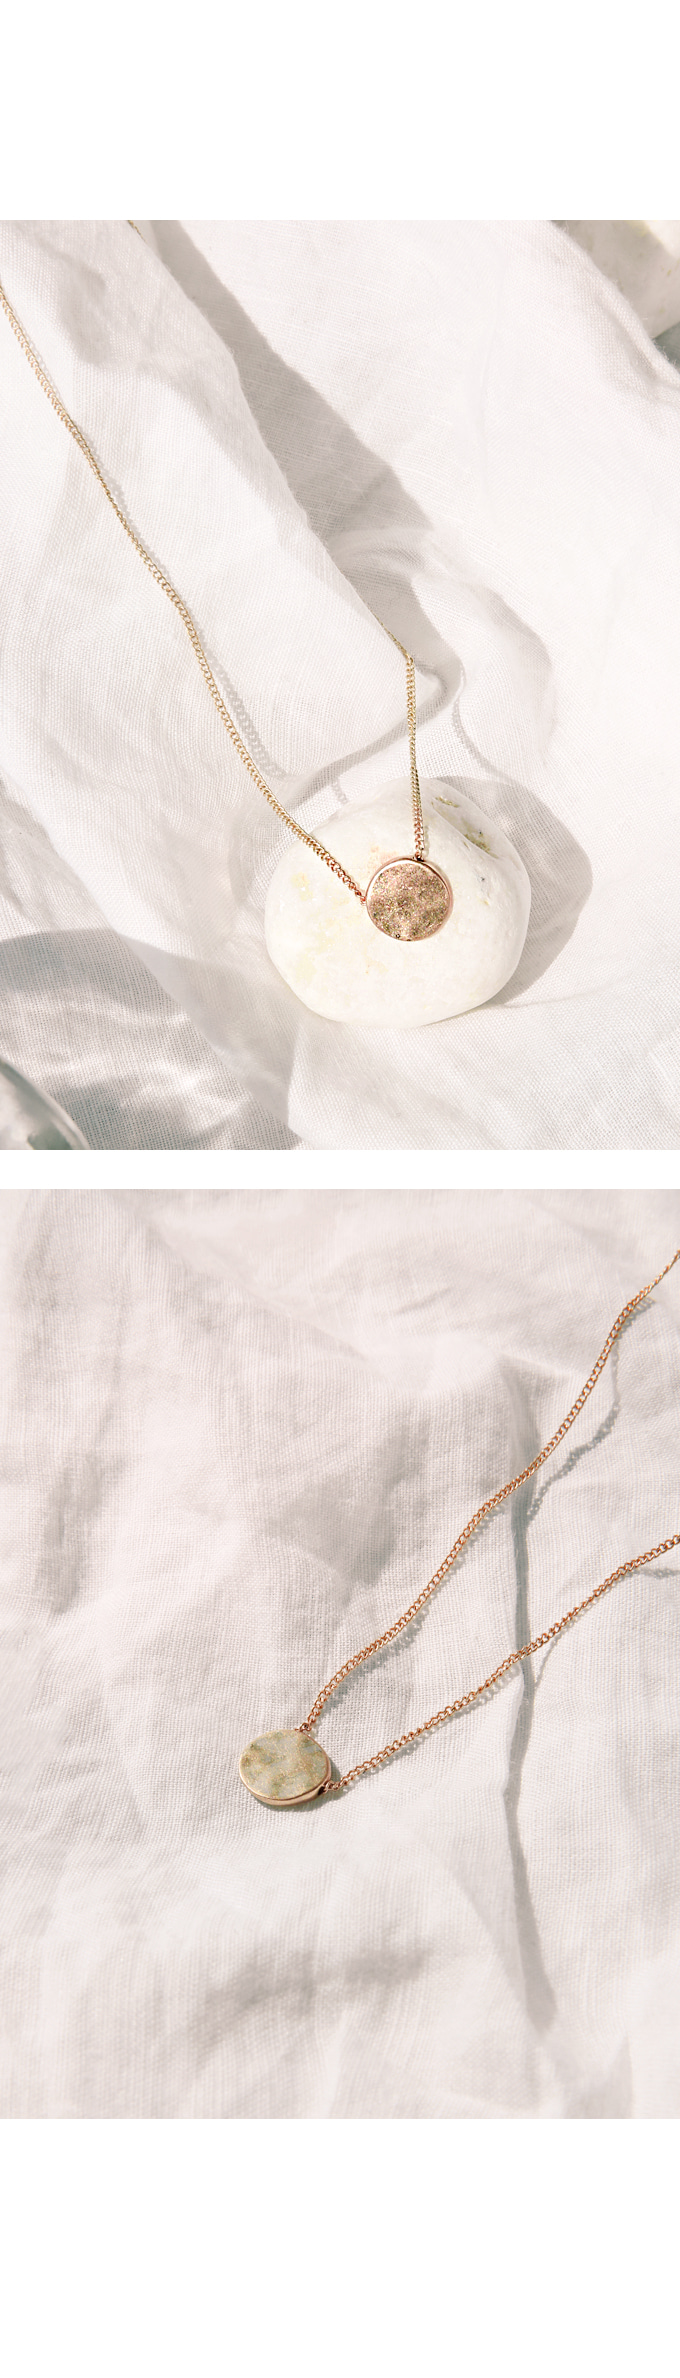 [JEWELRY] BASIC GOLD CIRCLE NECKLACE